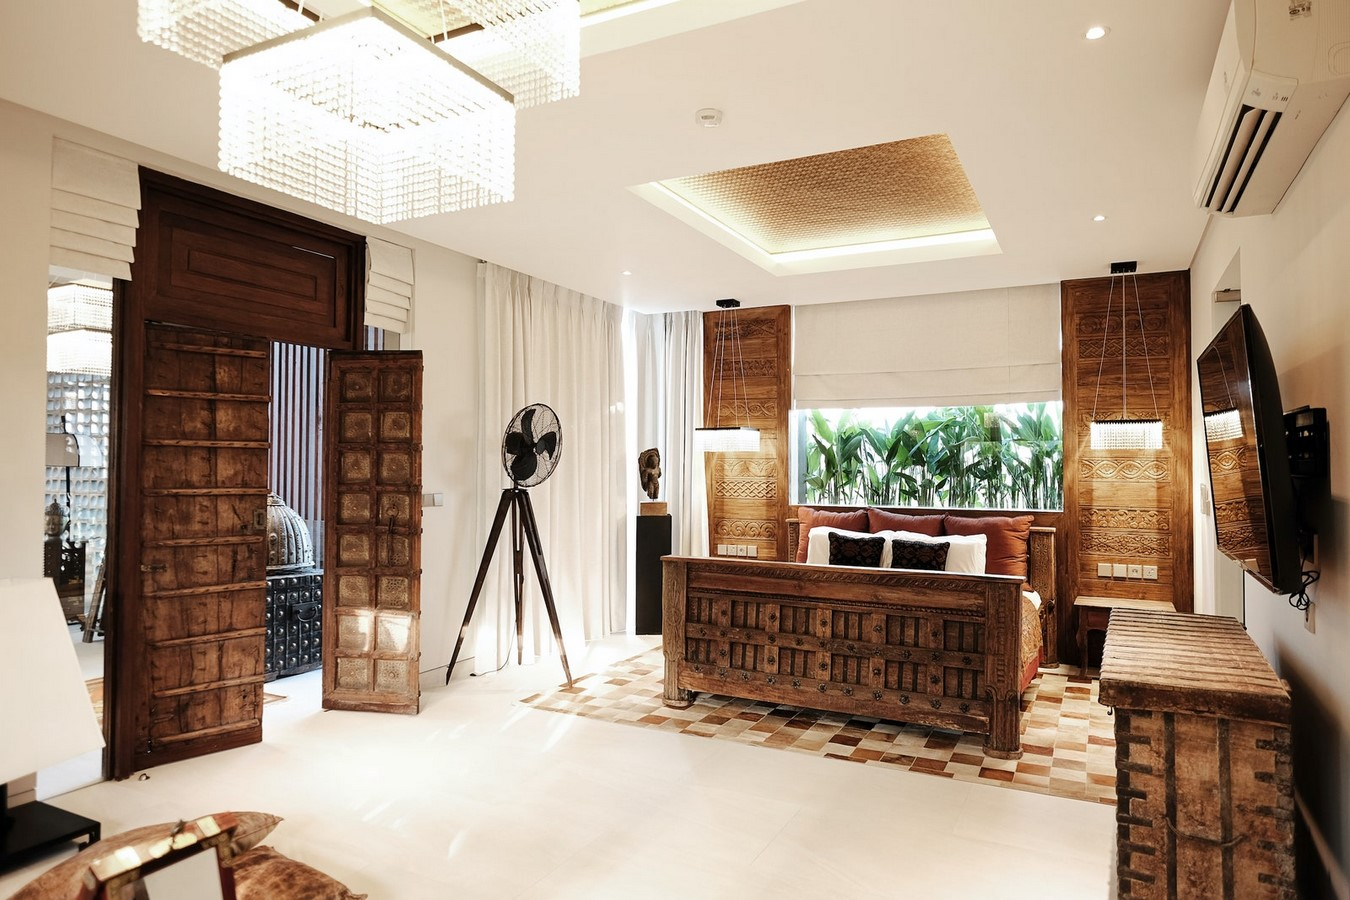 15 beautiful vintage apartments around the world - Sheet4